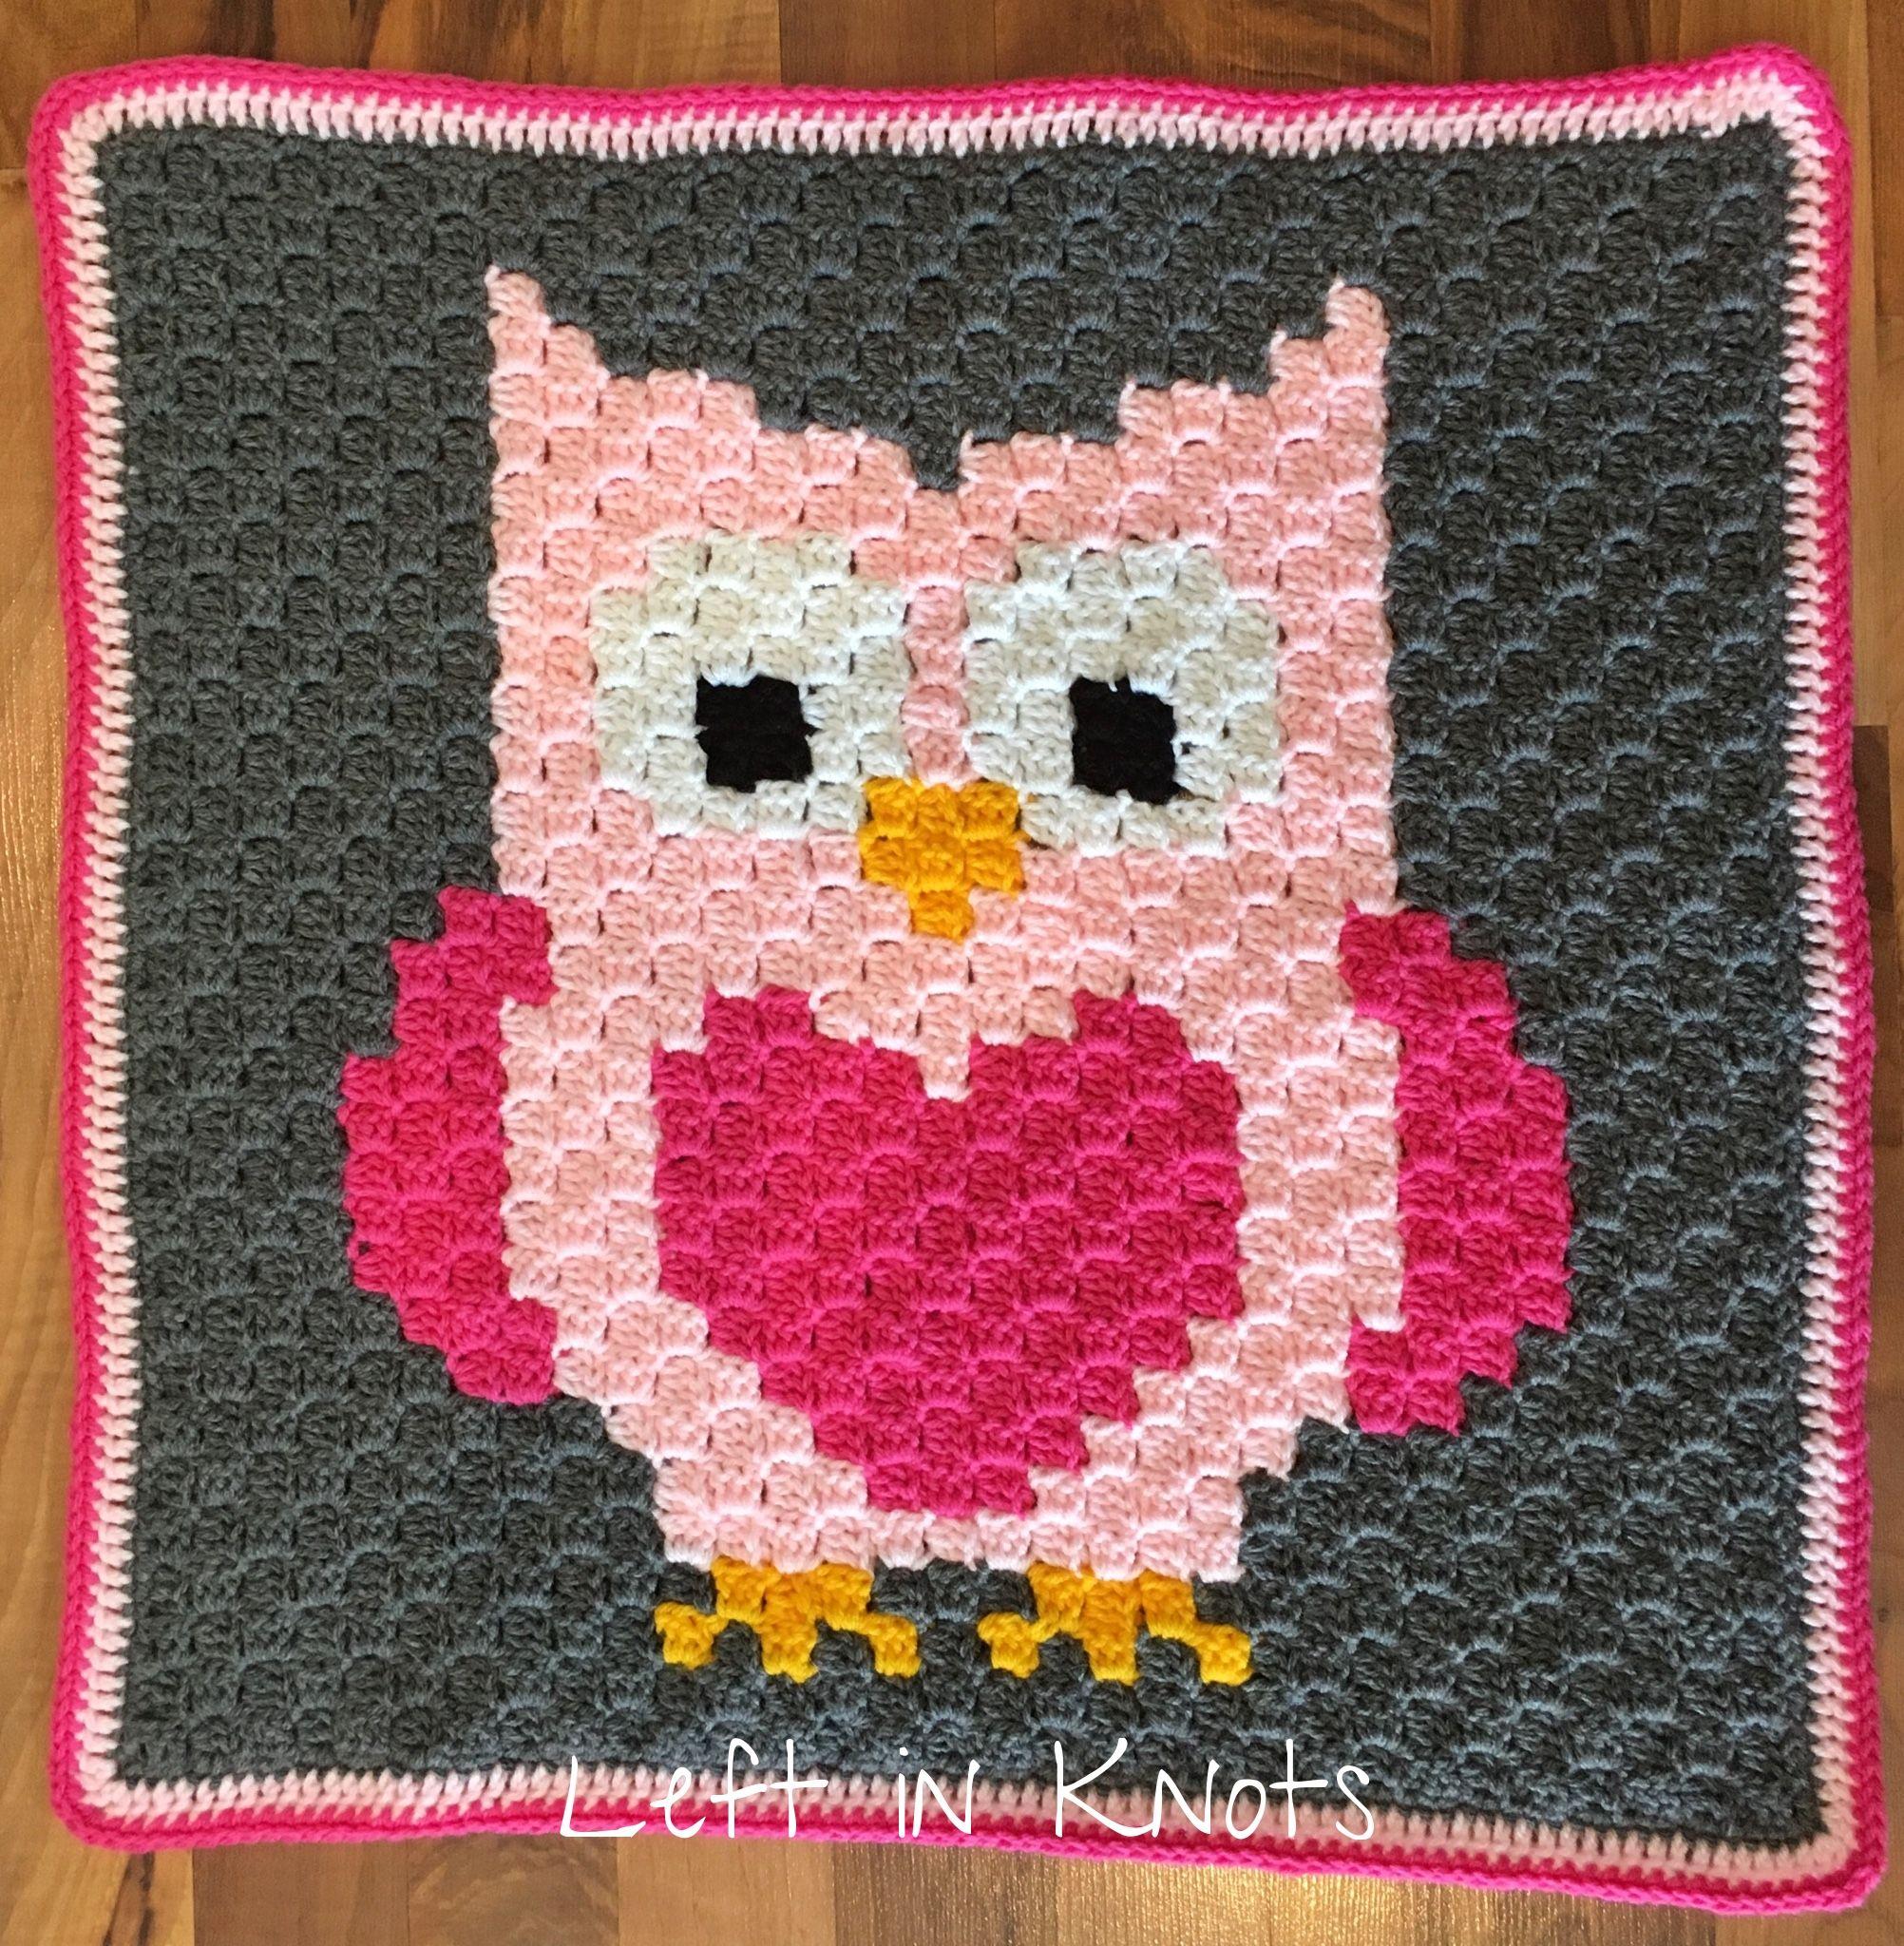 Owls, Foxes and Coons-Oh My! | Pinterest | Decken, Gehäkelte decken ...